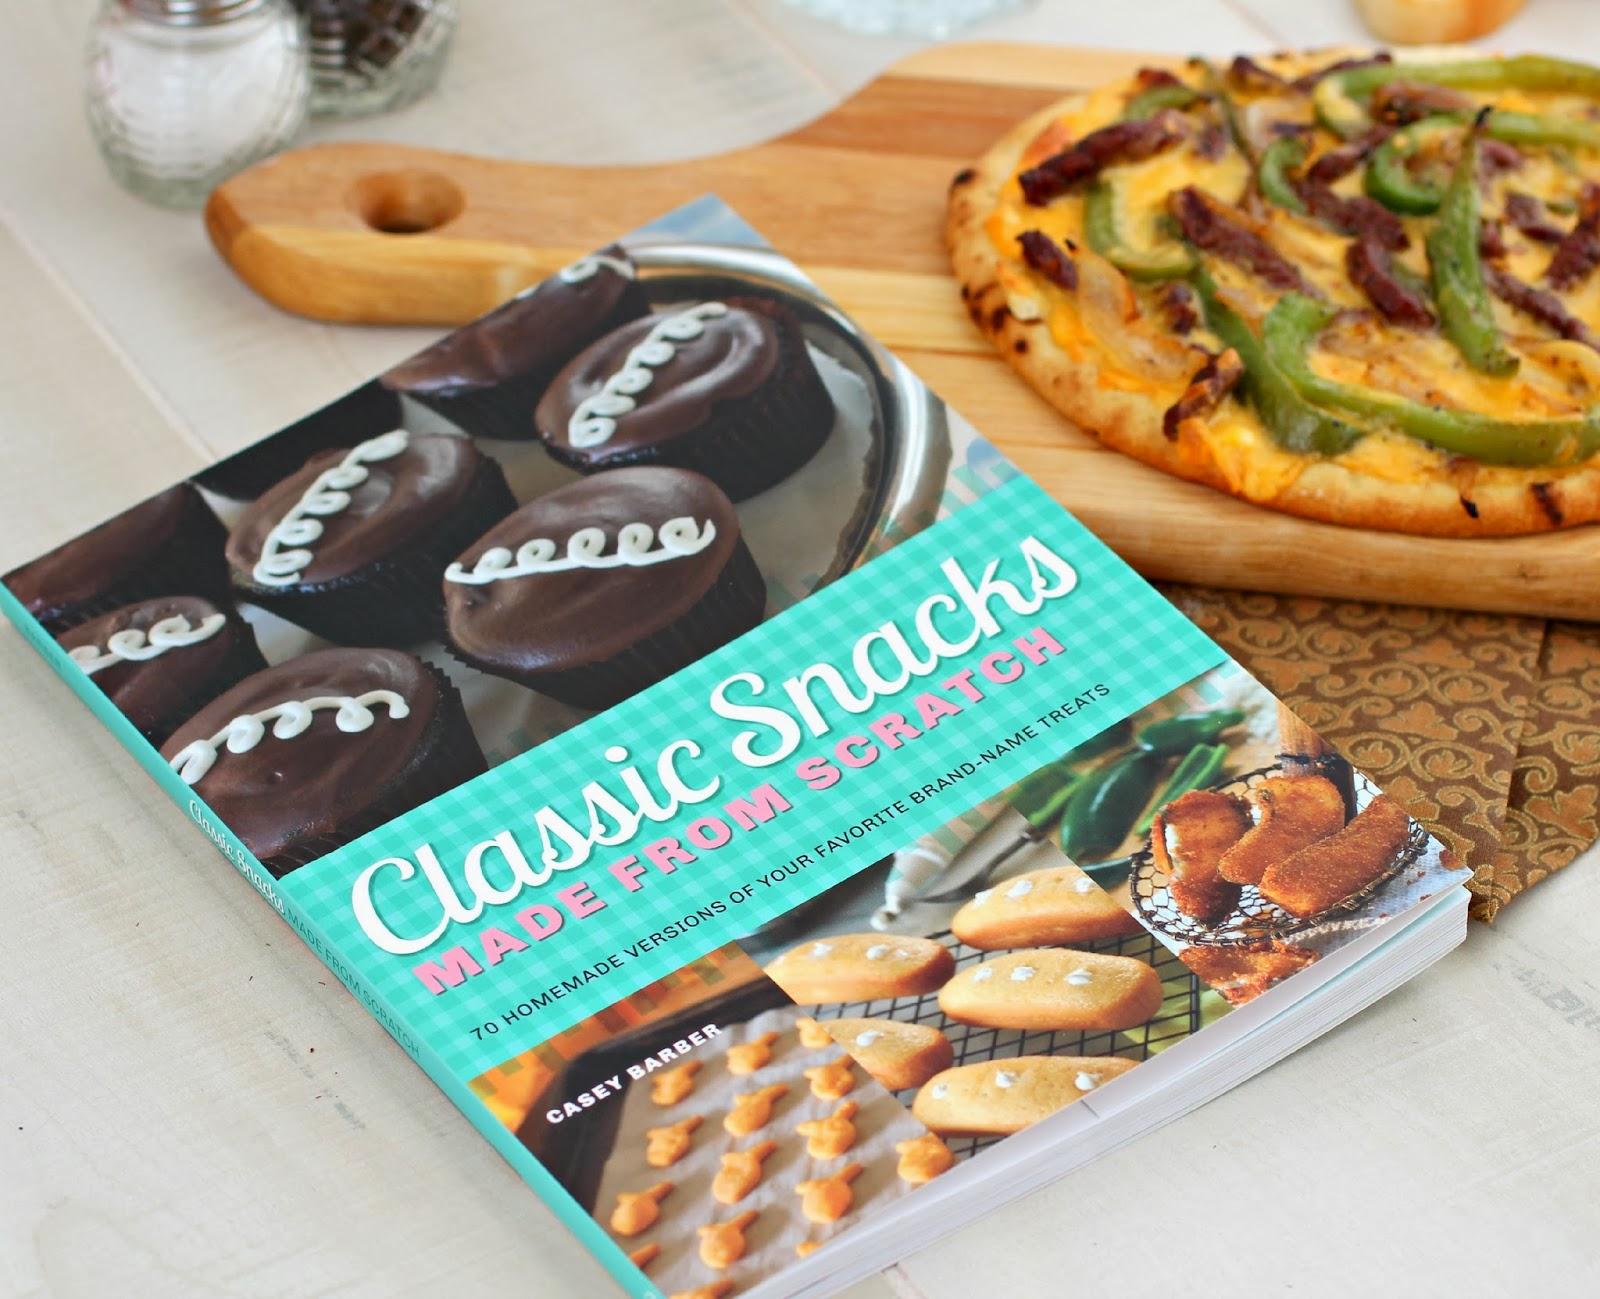 Kitchen Simmer: Philly Steak Pizza with Homemade Cheez Whiz